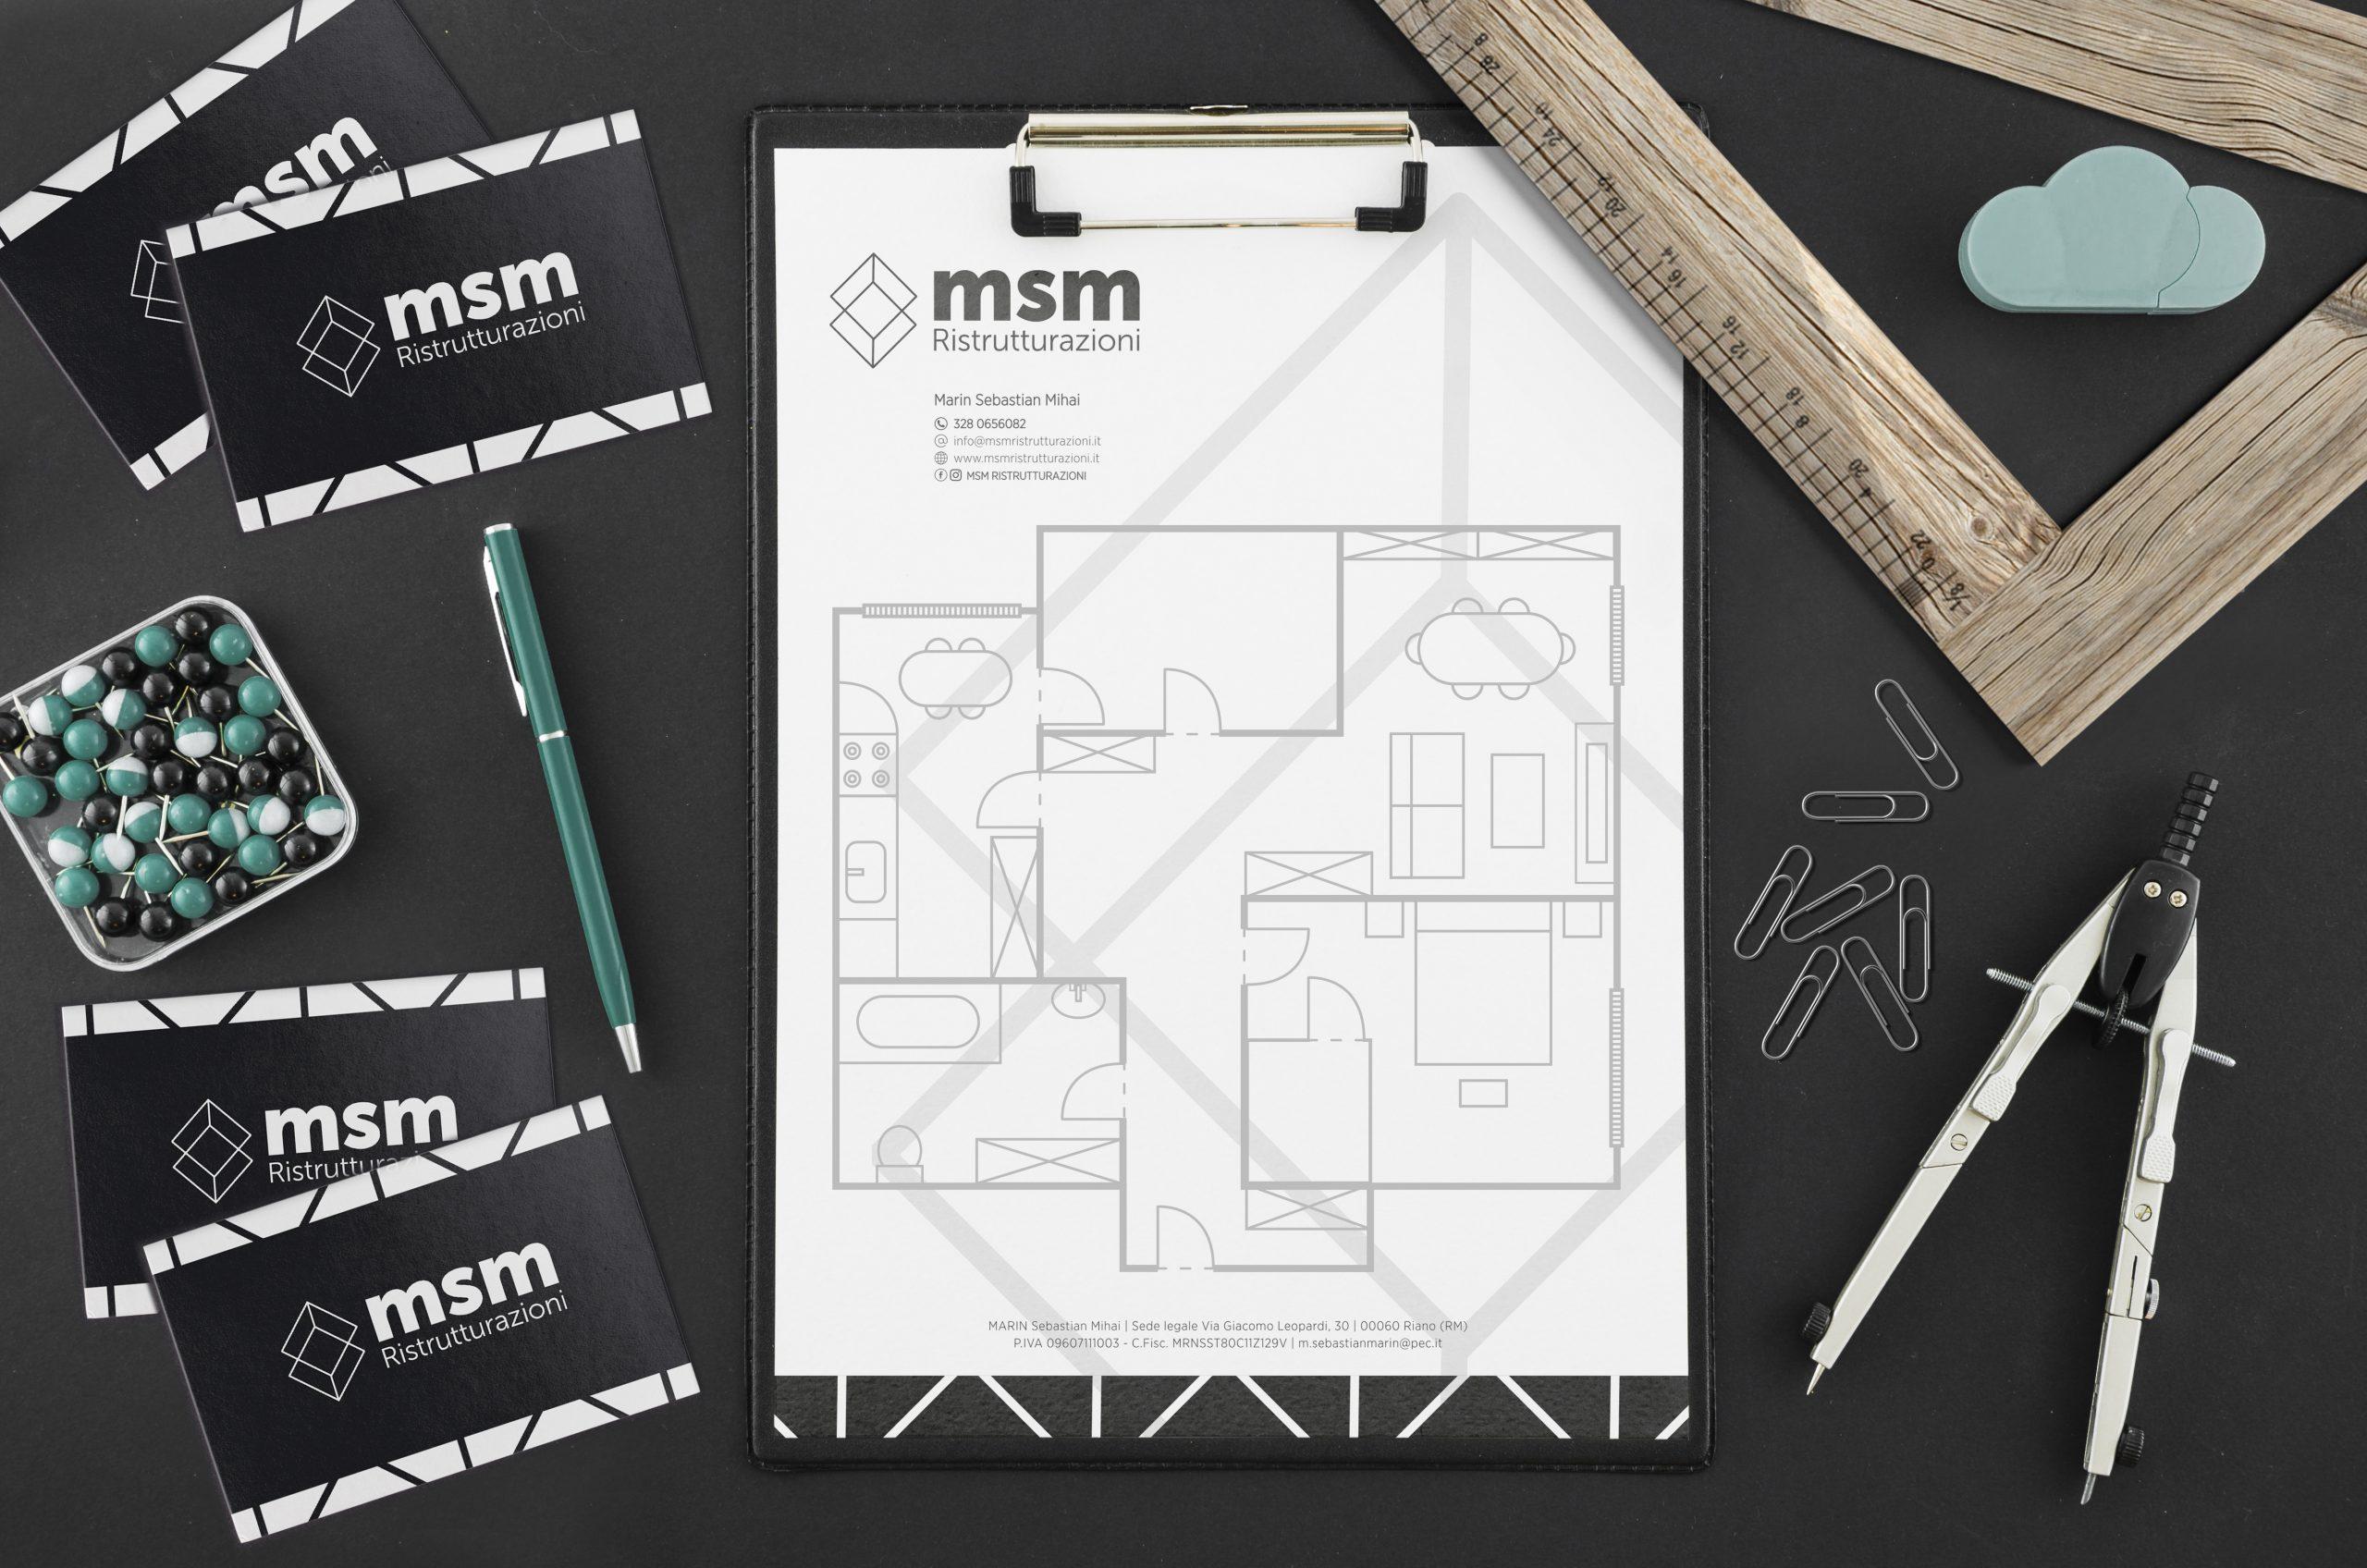 MSM_ristrutturazioni creazione logo